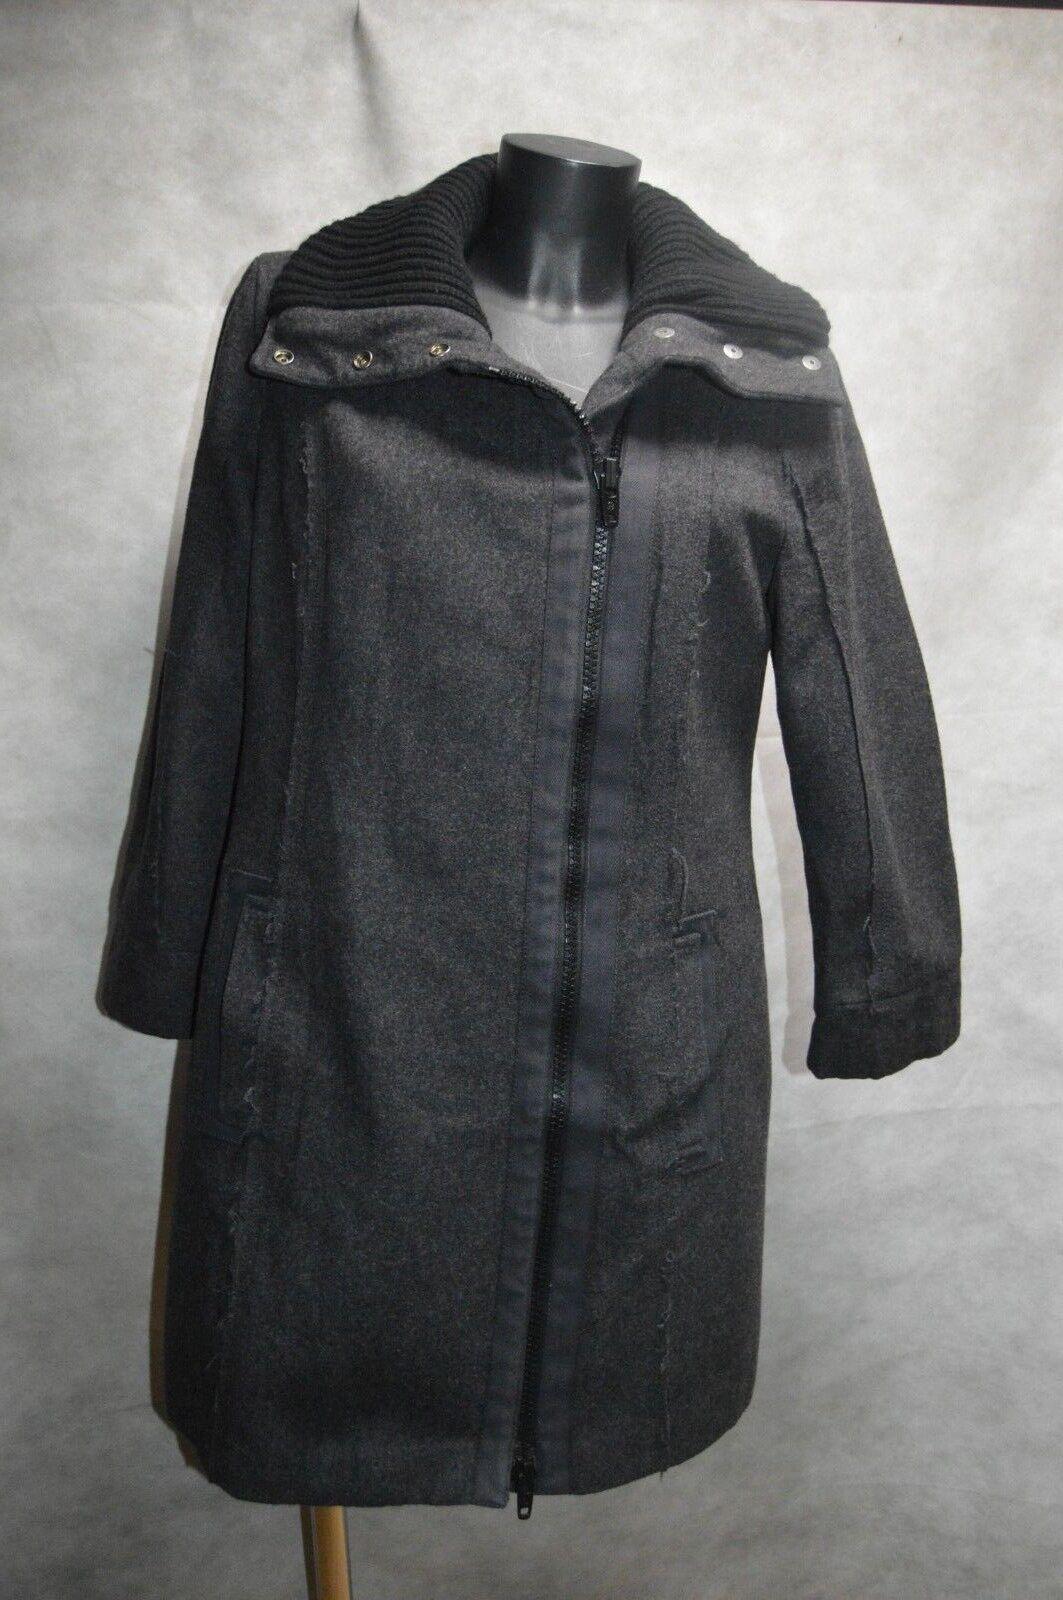 MANTEAU VESTE LAINE DKÑY DONA KARAN size L 40 GIACCA CHAQUETA COAT WOOL